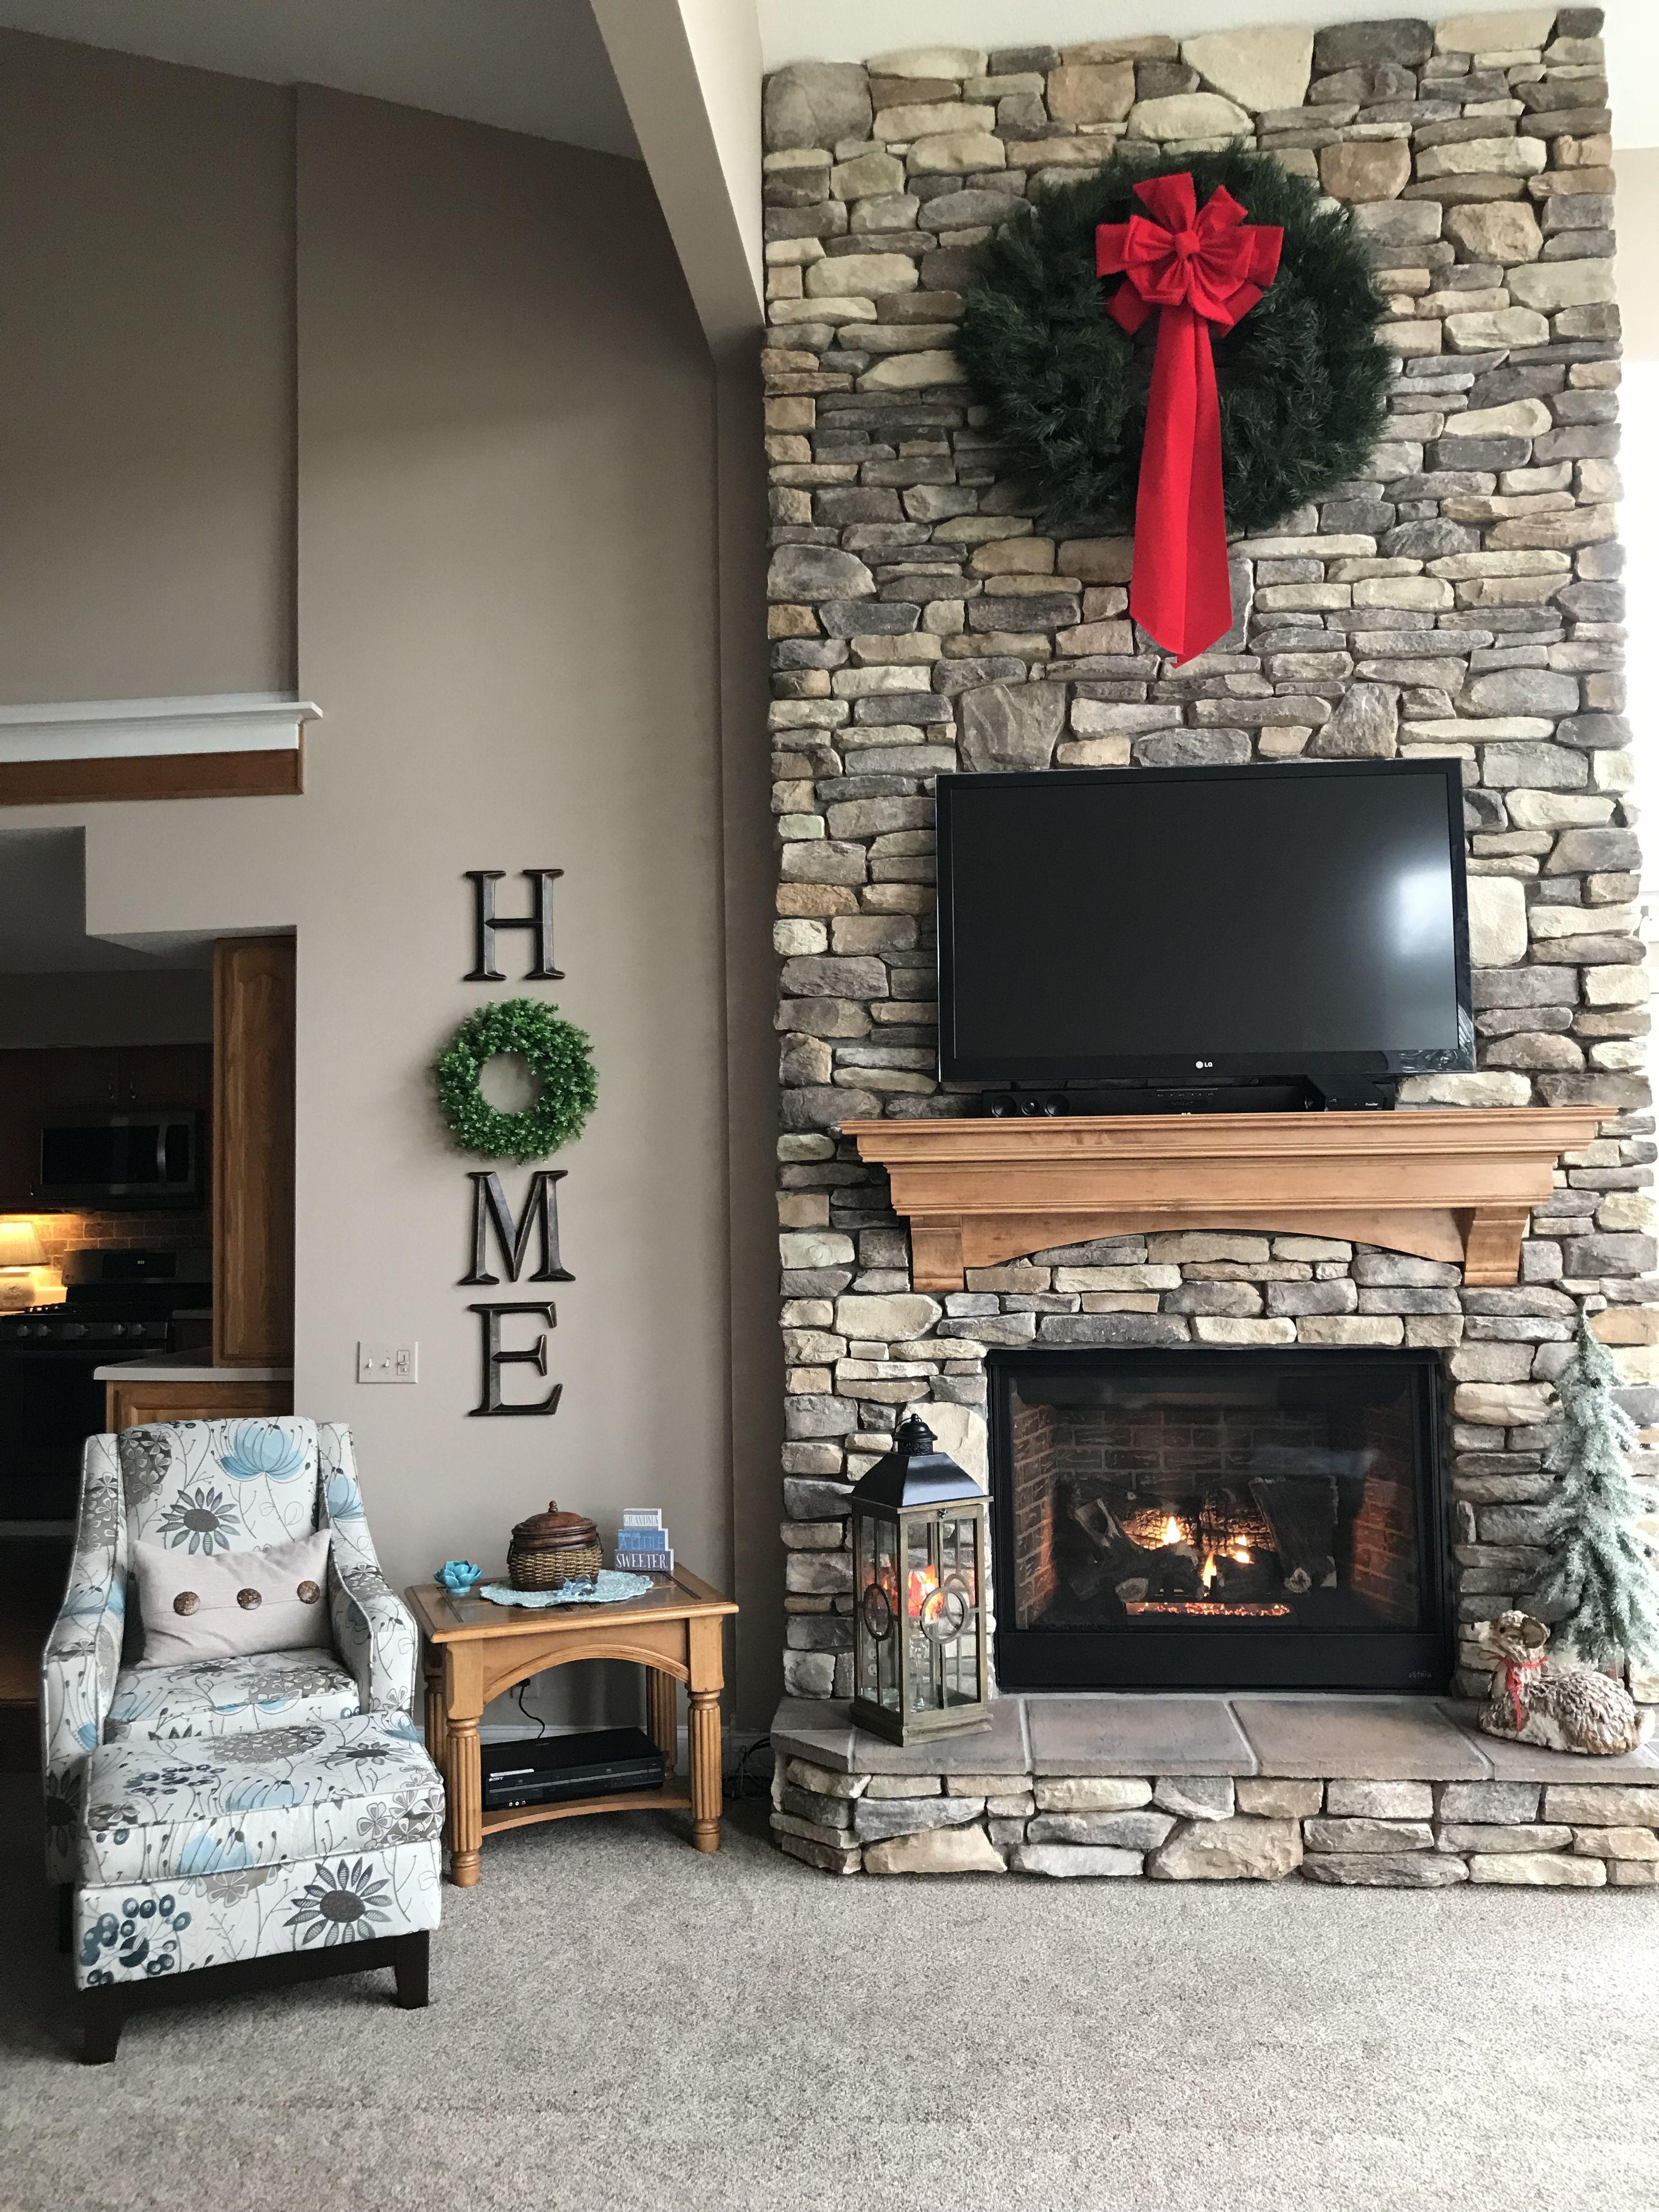 New fireplace!! | Fireplace, Holiday decor, Decor